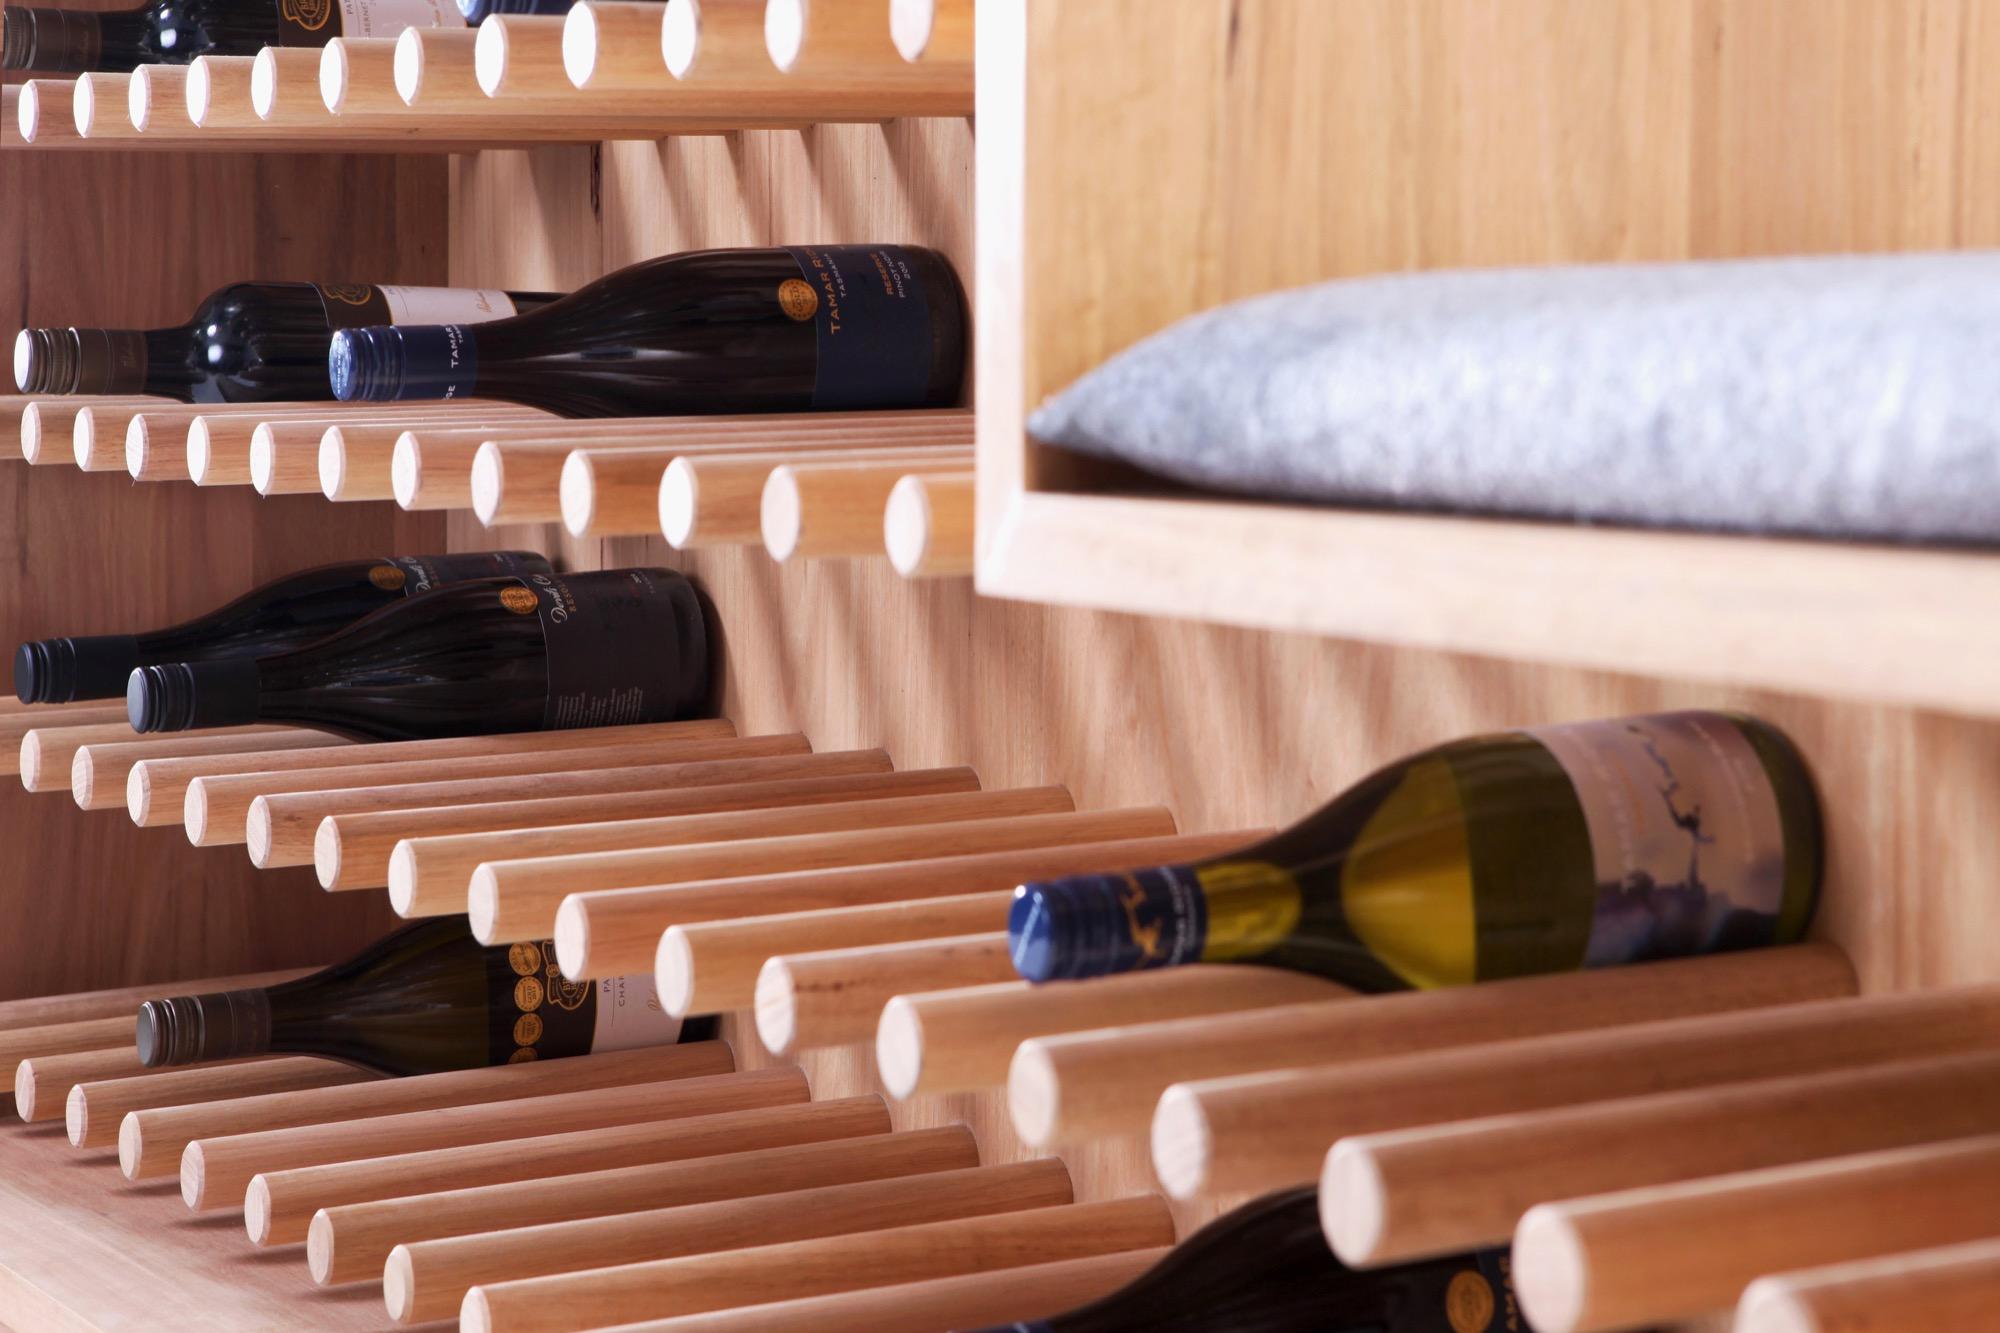 Vino Sideboard by Sawdust Bureau 02